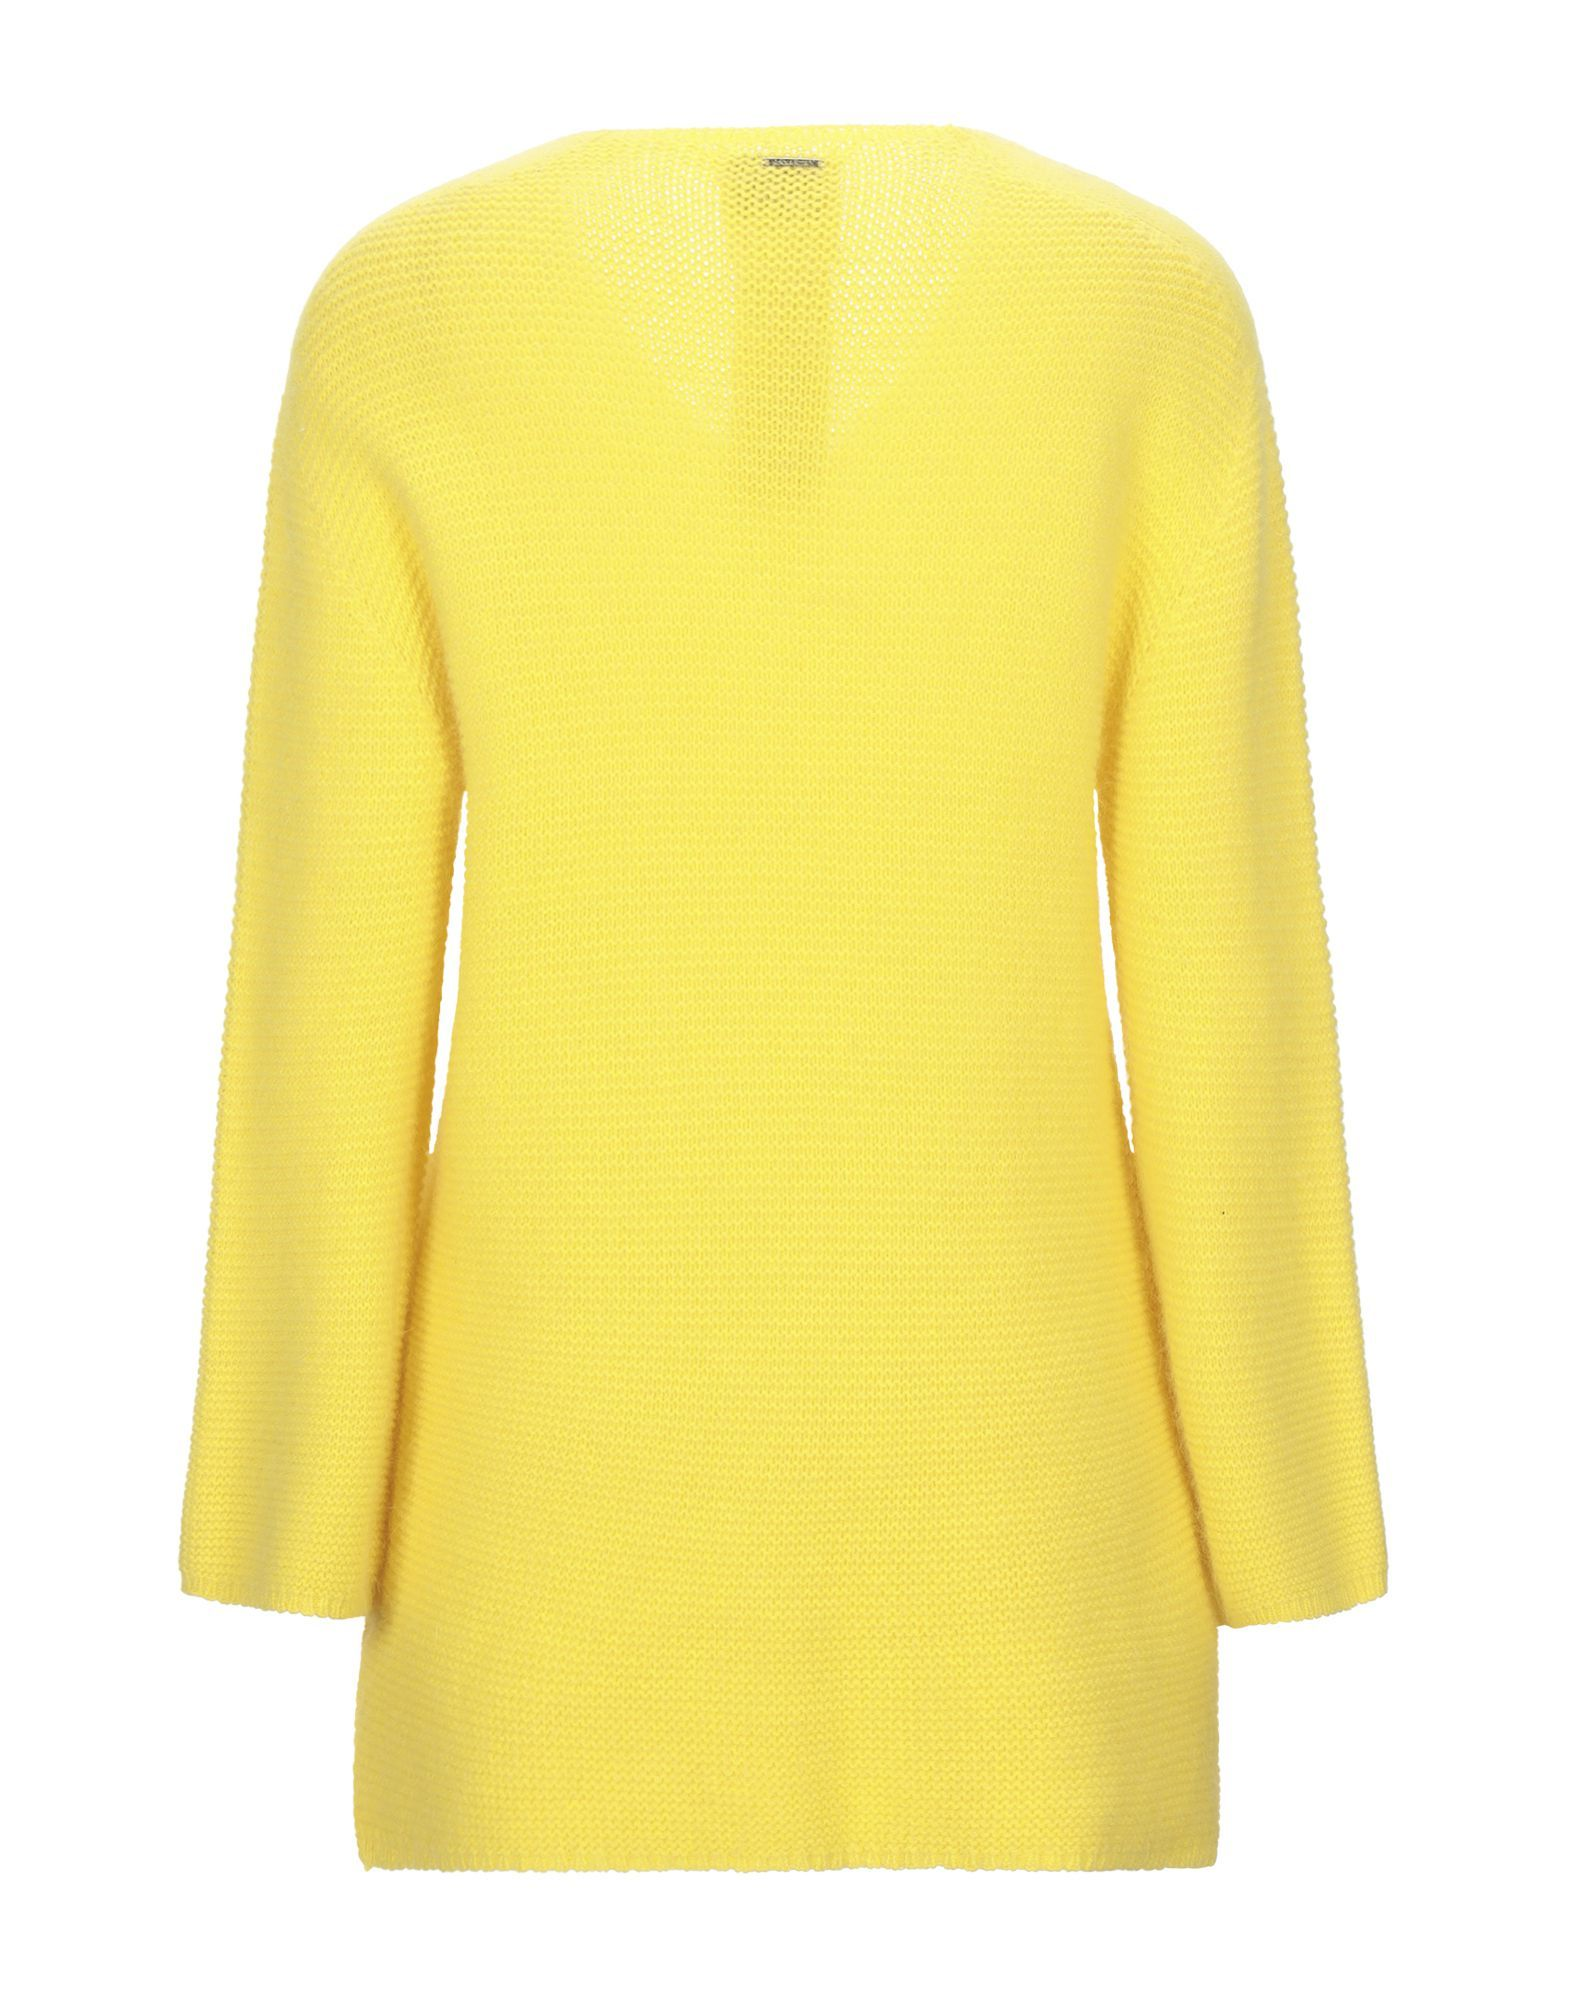 Annarita N Twenty 4H Yellow Angora V Neck Jumper